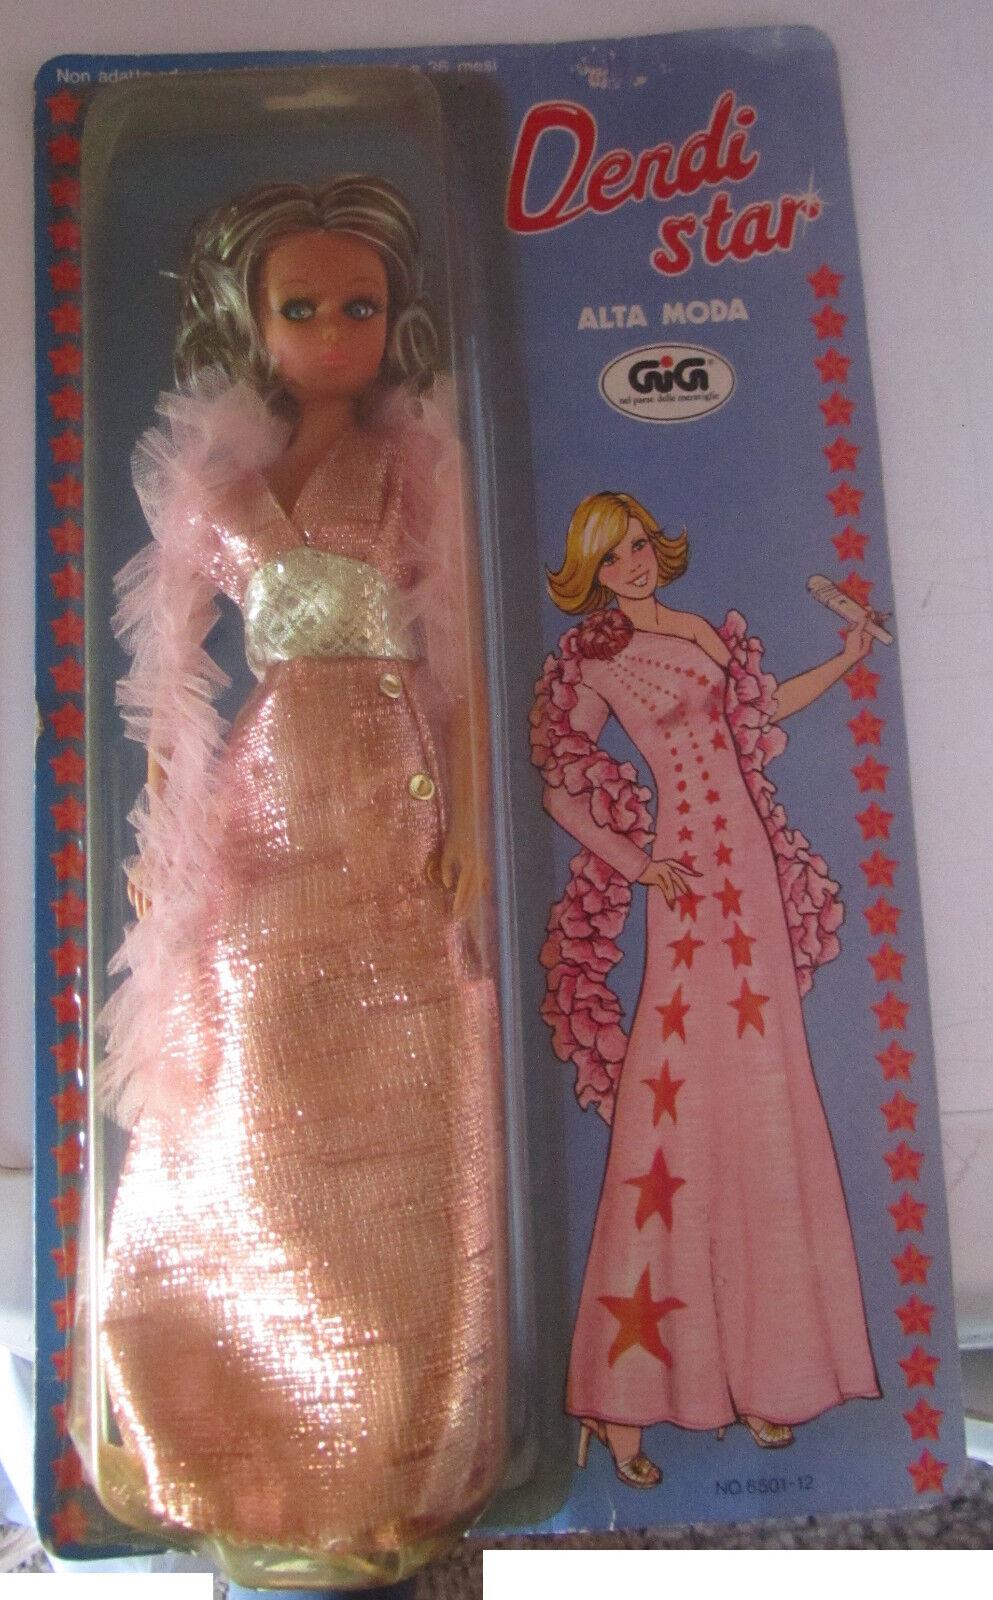 Bambola Dendi Star Alta Moda GIG Vestito rosado anni 80 Doll SPESE GRATIS